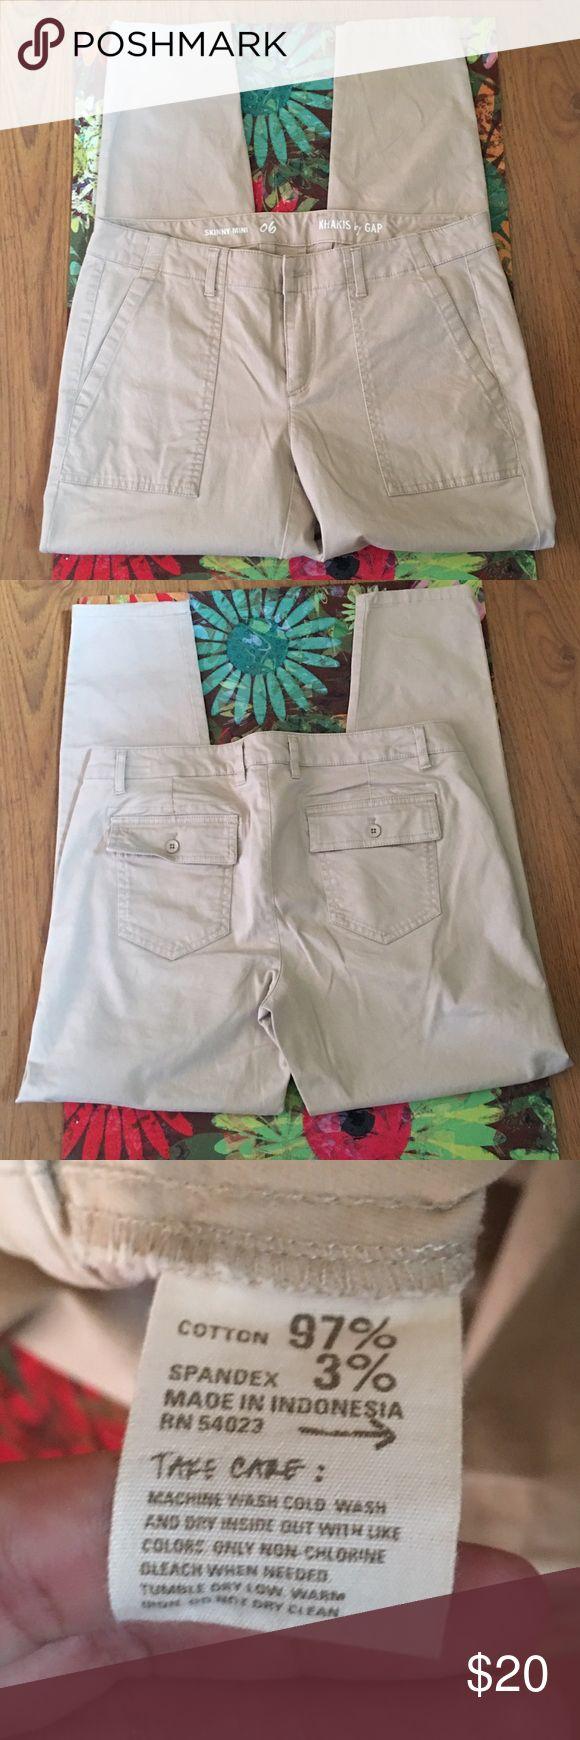 NWOT🆕 Gap Skinny Mini Kakis NWOT 🆕 Excellent Condition❣ GAP Jeans Skinny